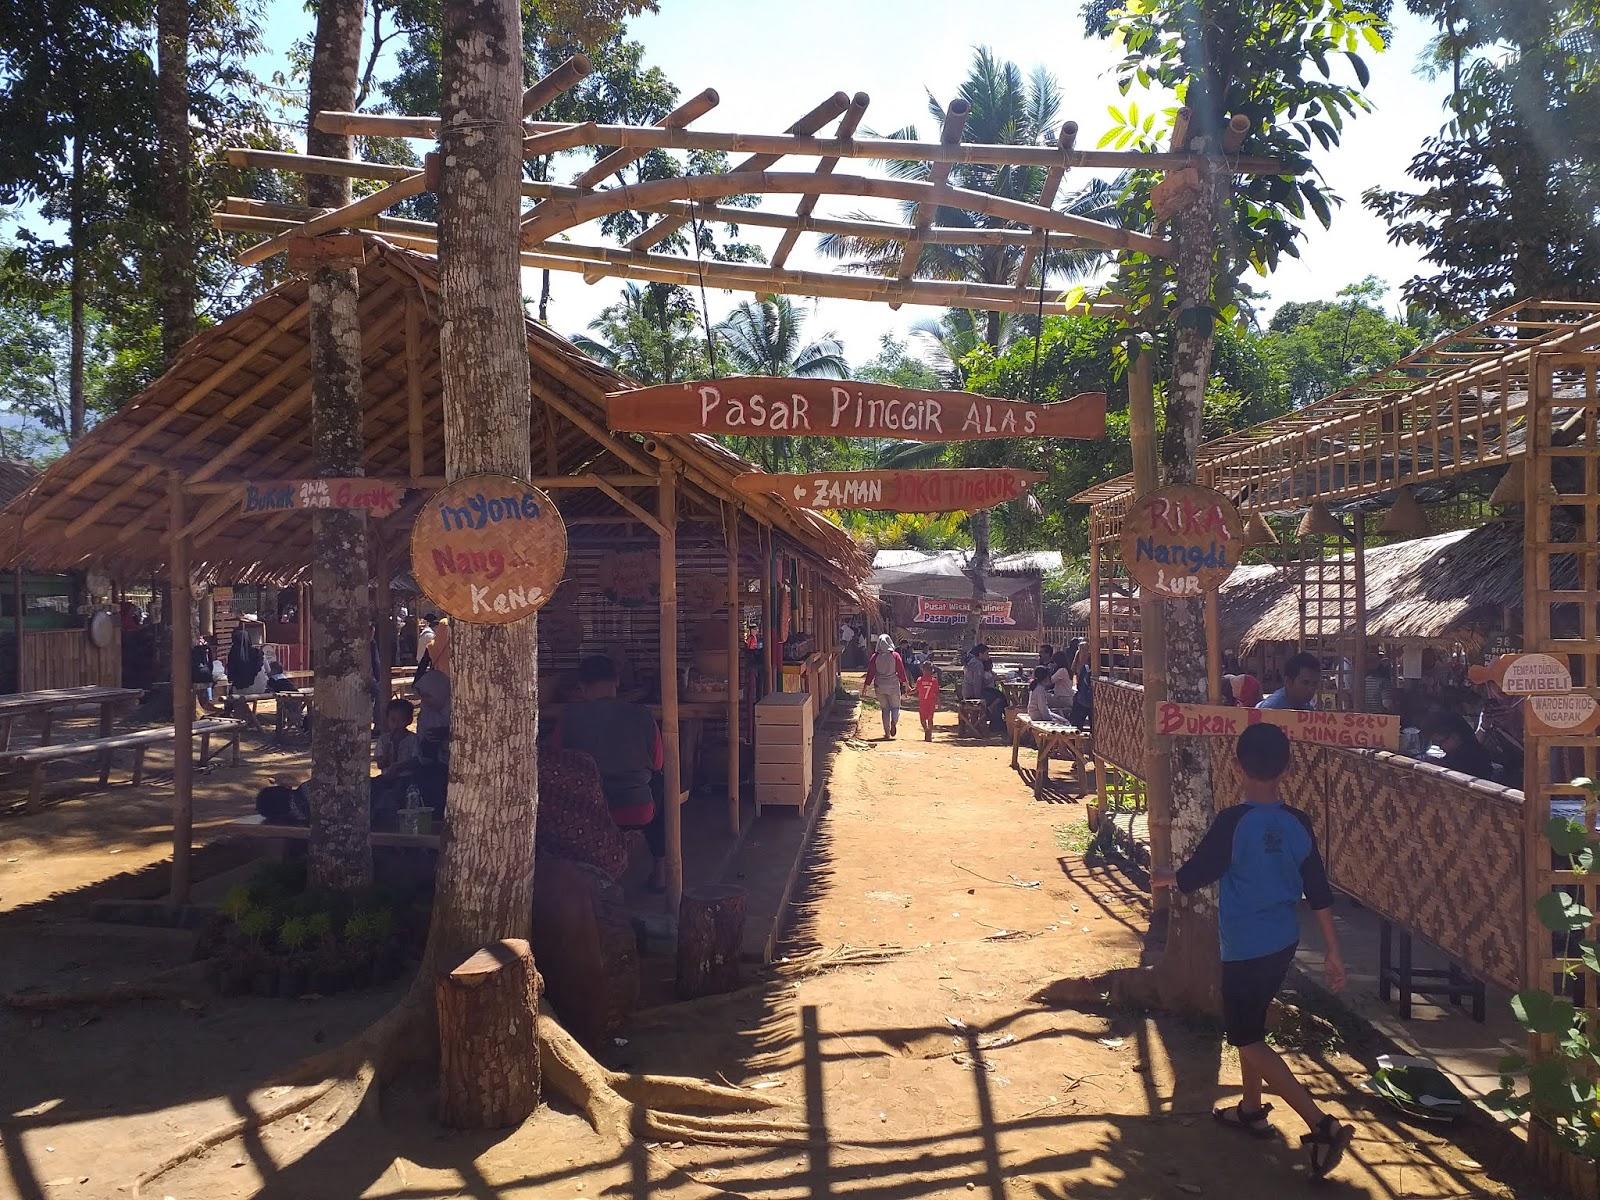 Pasar Pinggir Alas Wisata Kuliner Baru Di Baturaden Lpm